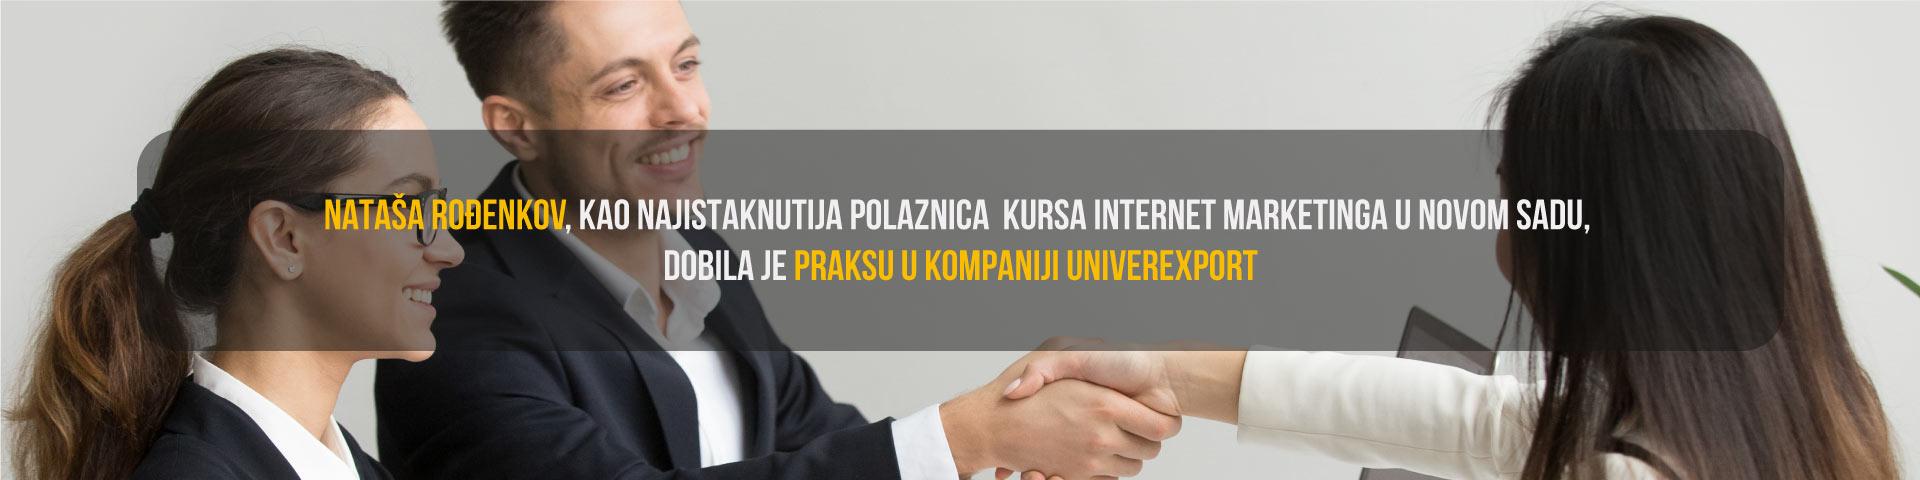 Slider_Uspesi_Polaznika-UnExport-1